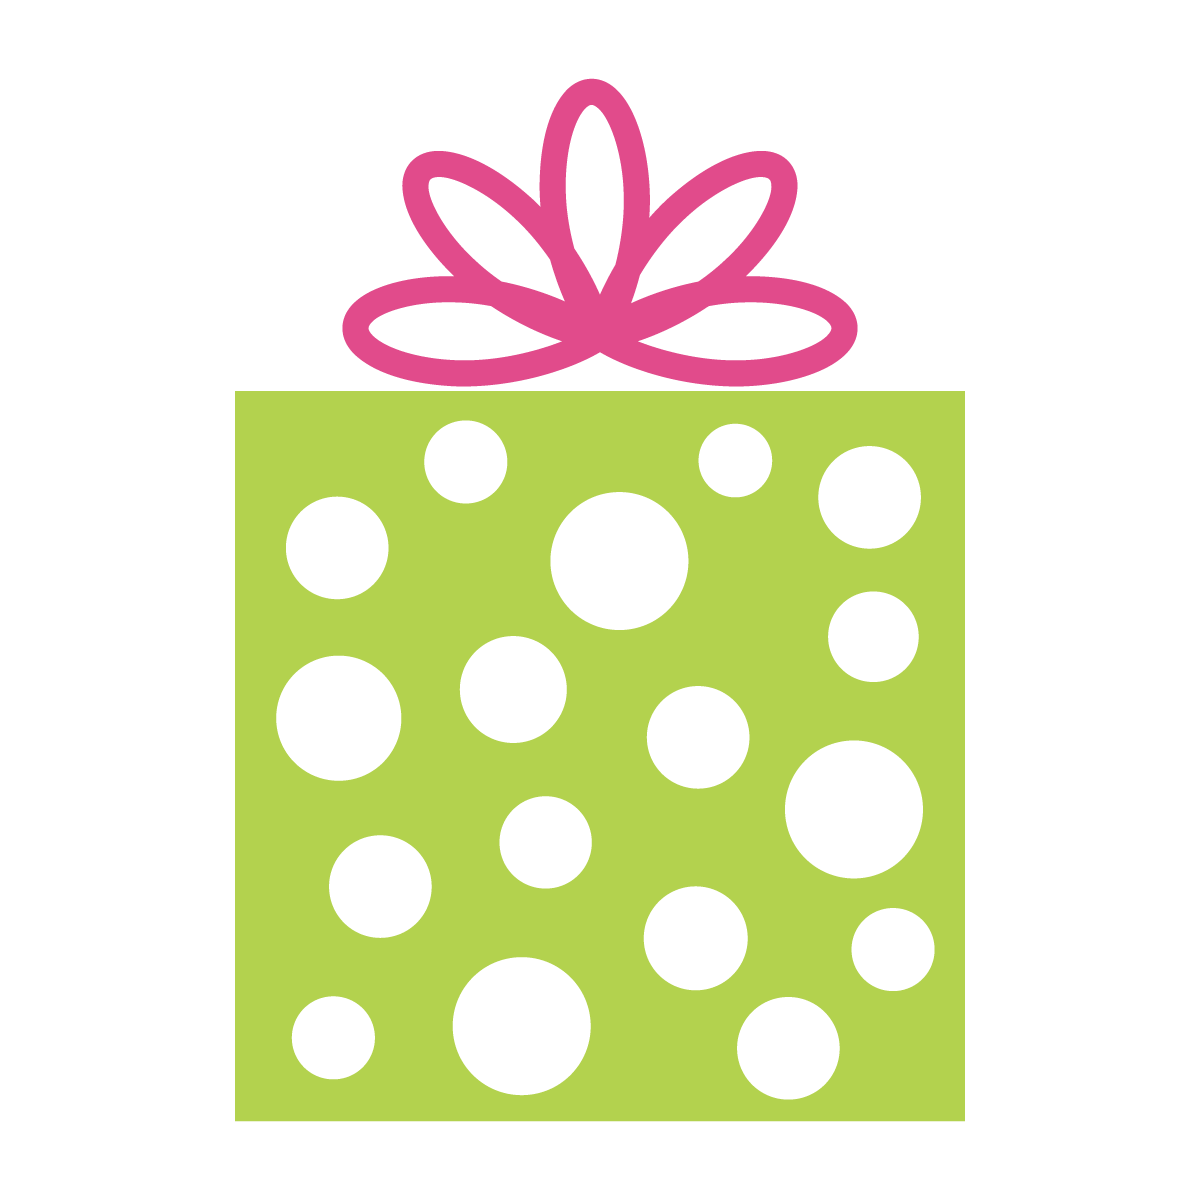 Birthday Present Clip Art Free - ClipArt Best (1200 x 1200 Pixel)